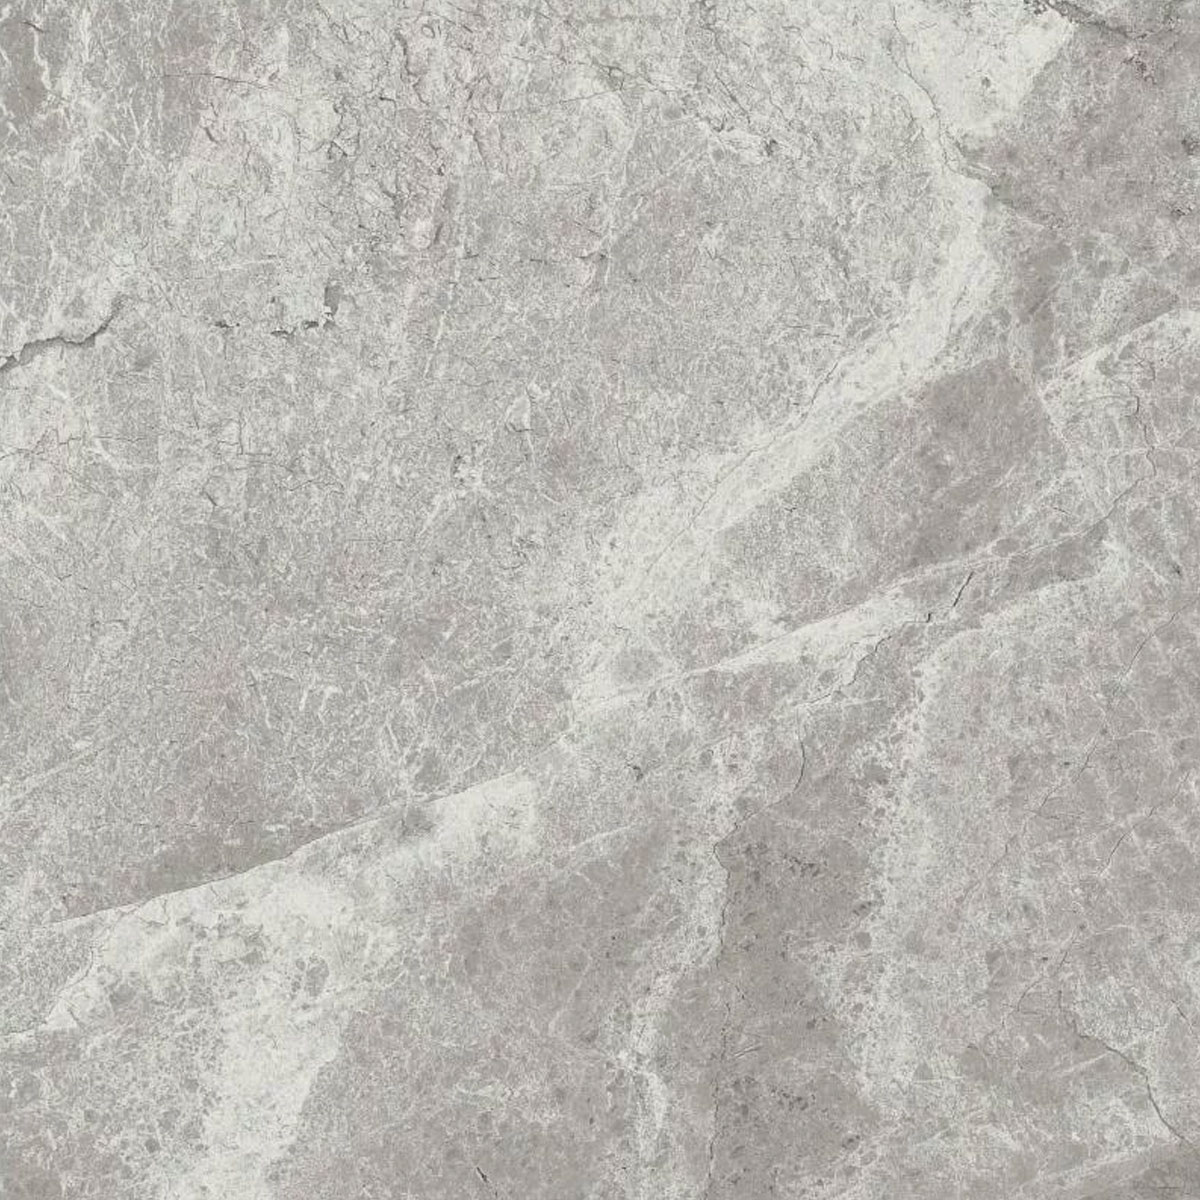 Tundra - Storm - Marble Look Tiles - Stone3 Brisbane